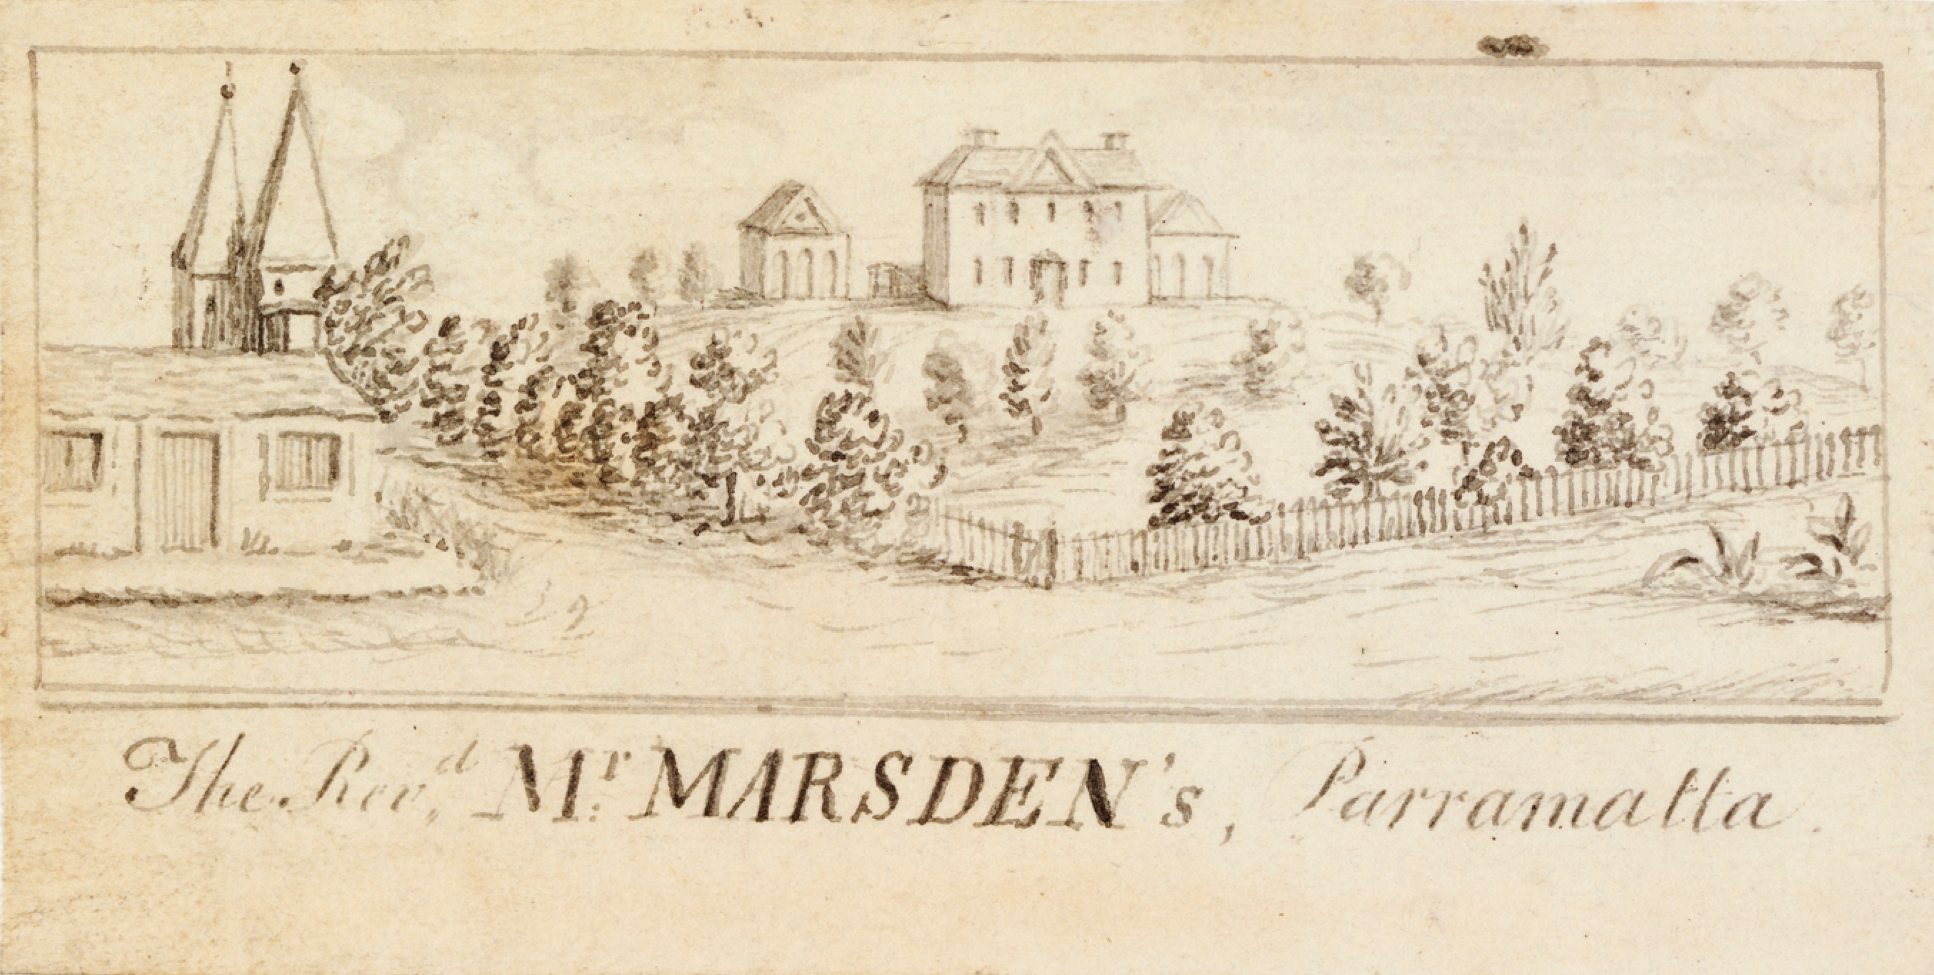 Reverend Samuel Marsden, Parramatta, Parsonage, St. John's Church, Old Parramattans, St. John's Cemetery, St. John's Cemetery Project